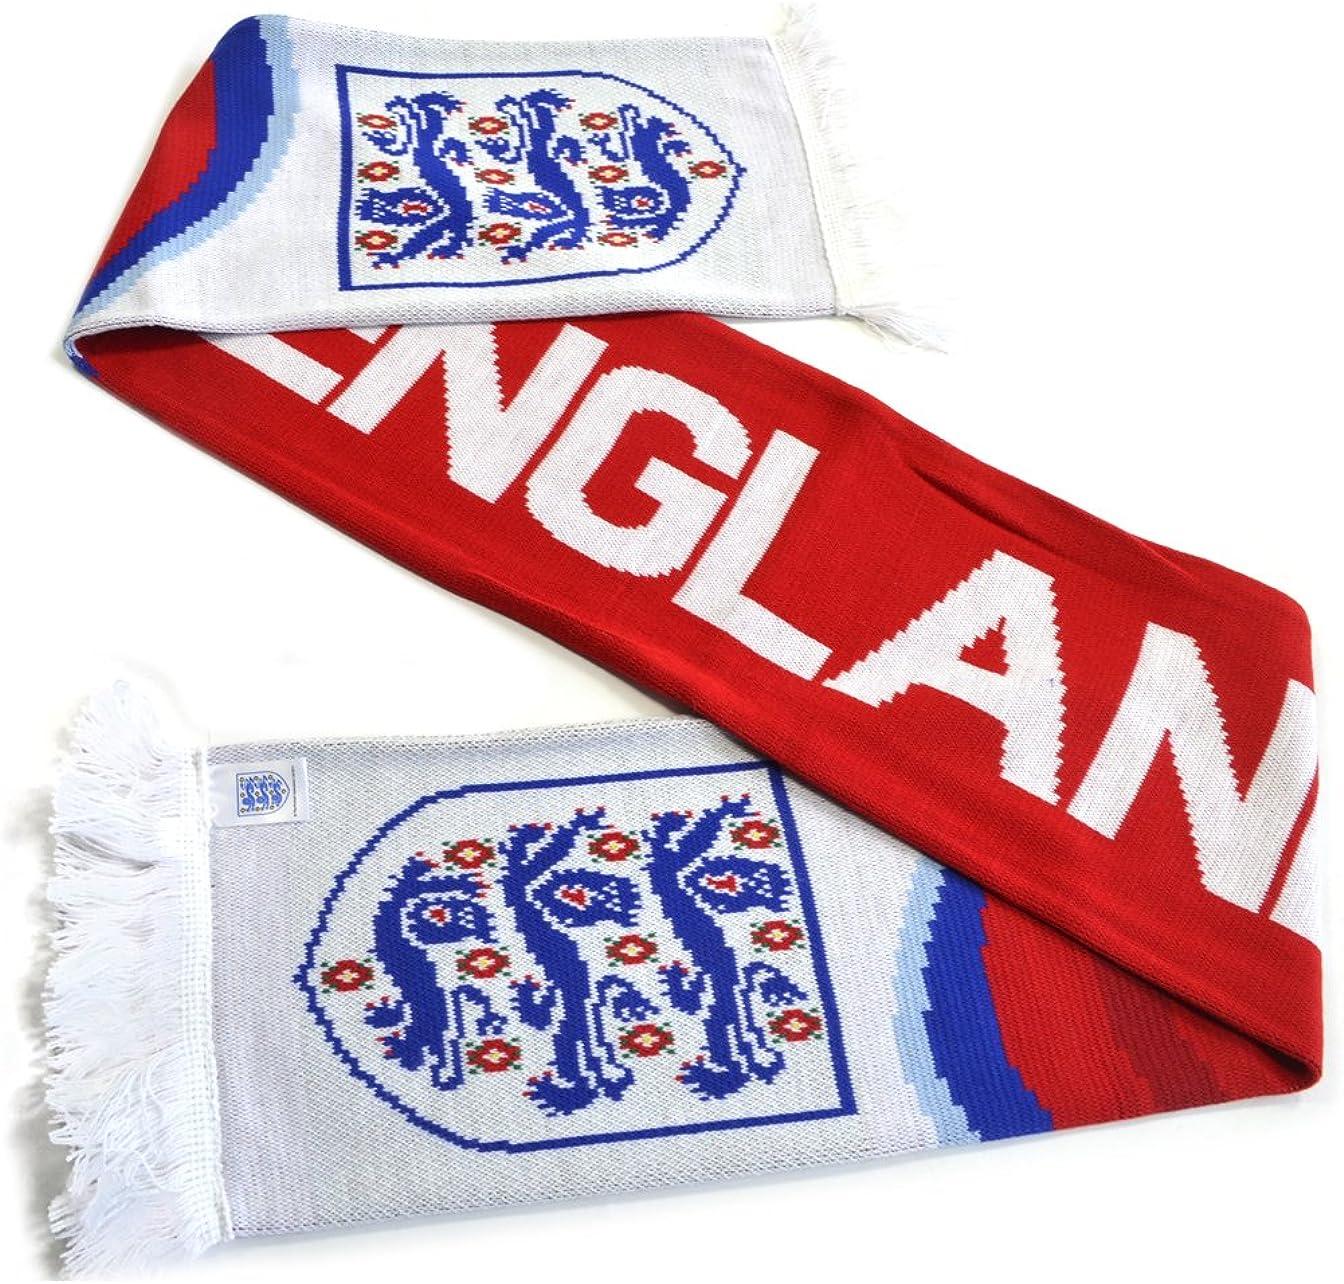 England FA Swirl Scarf Red